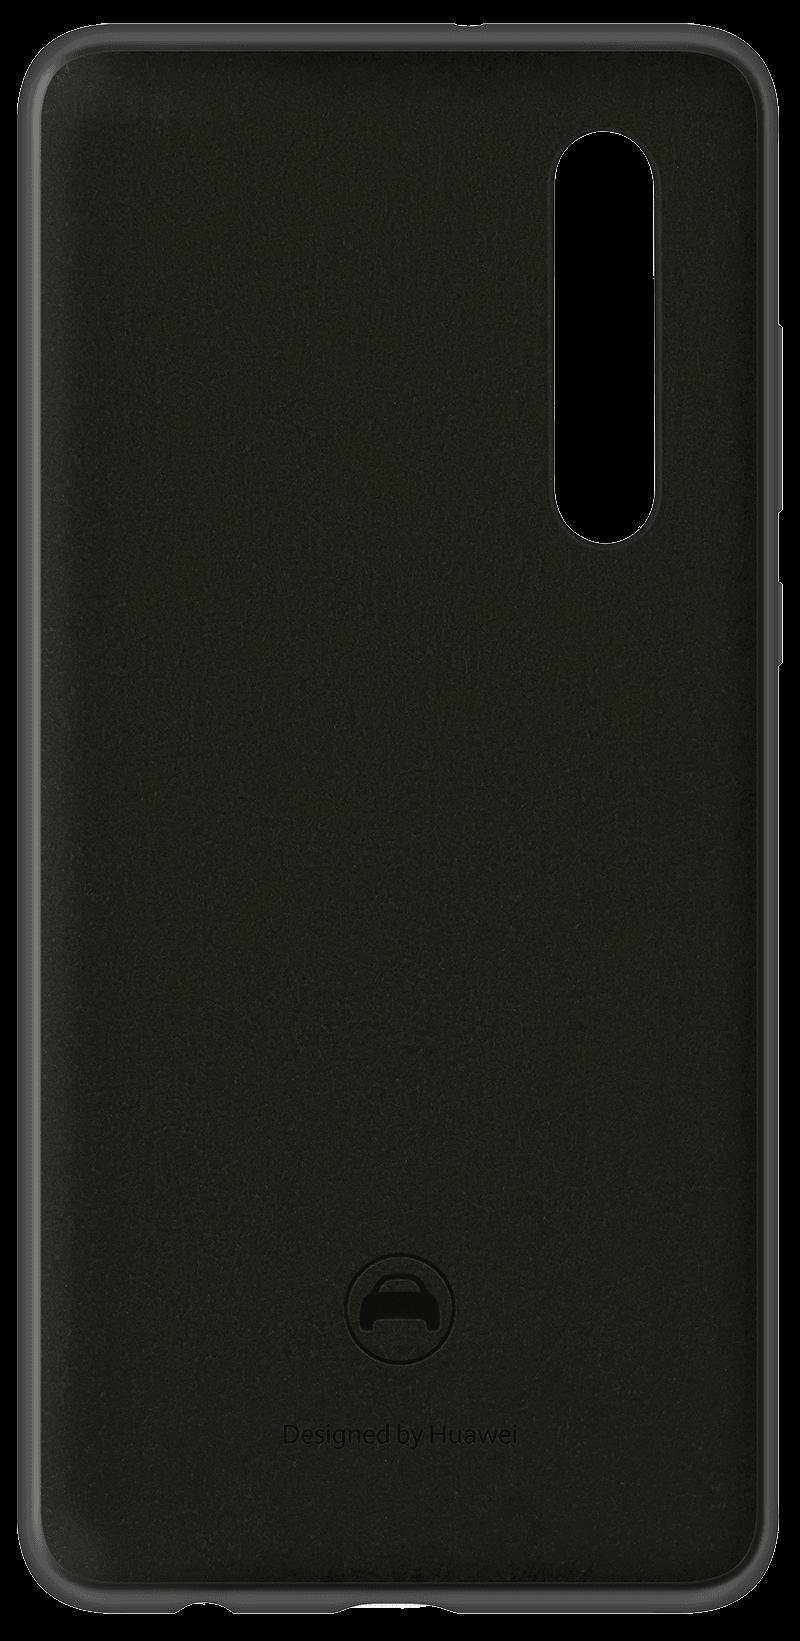 Coque silicone Huawei P30 noir